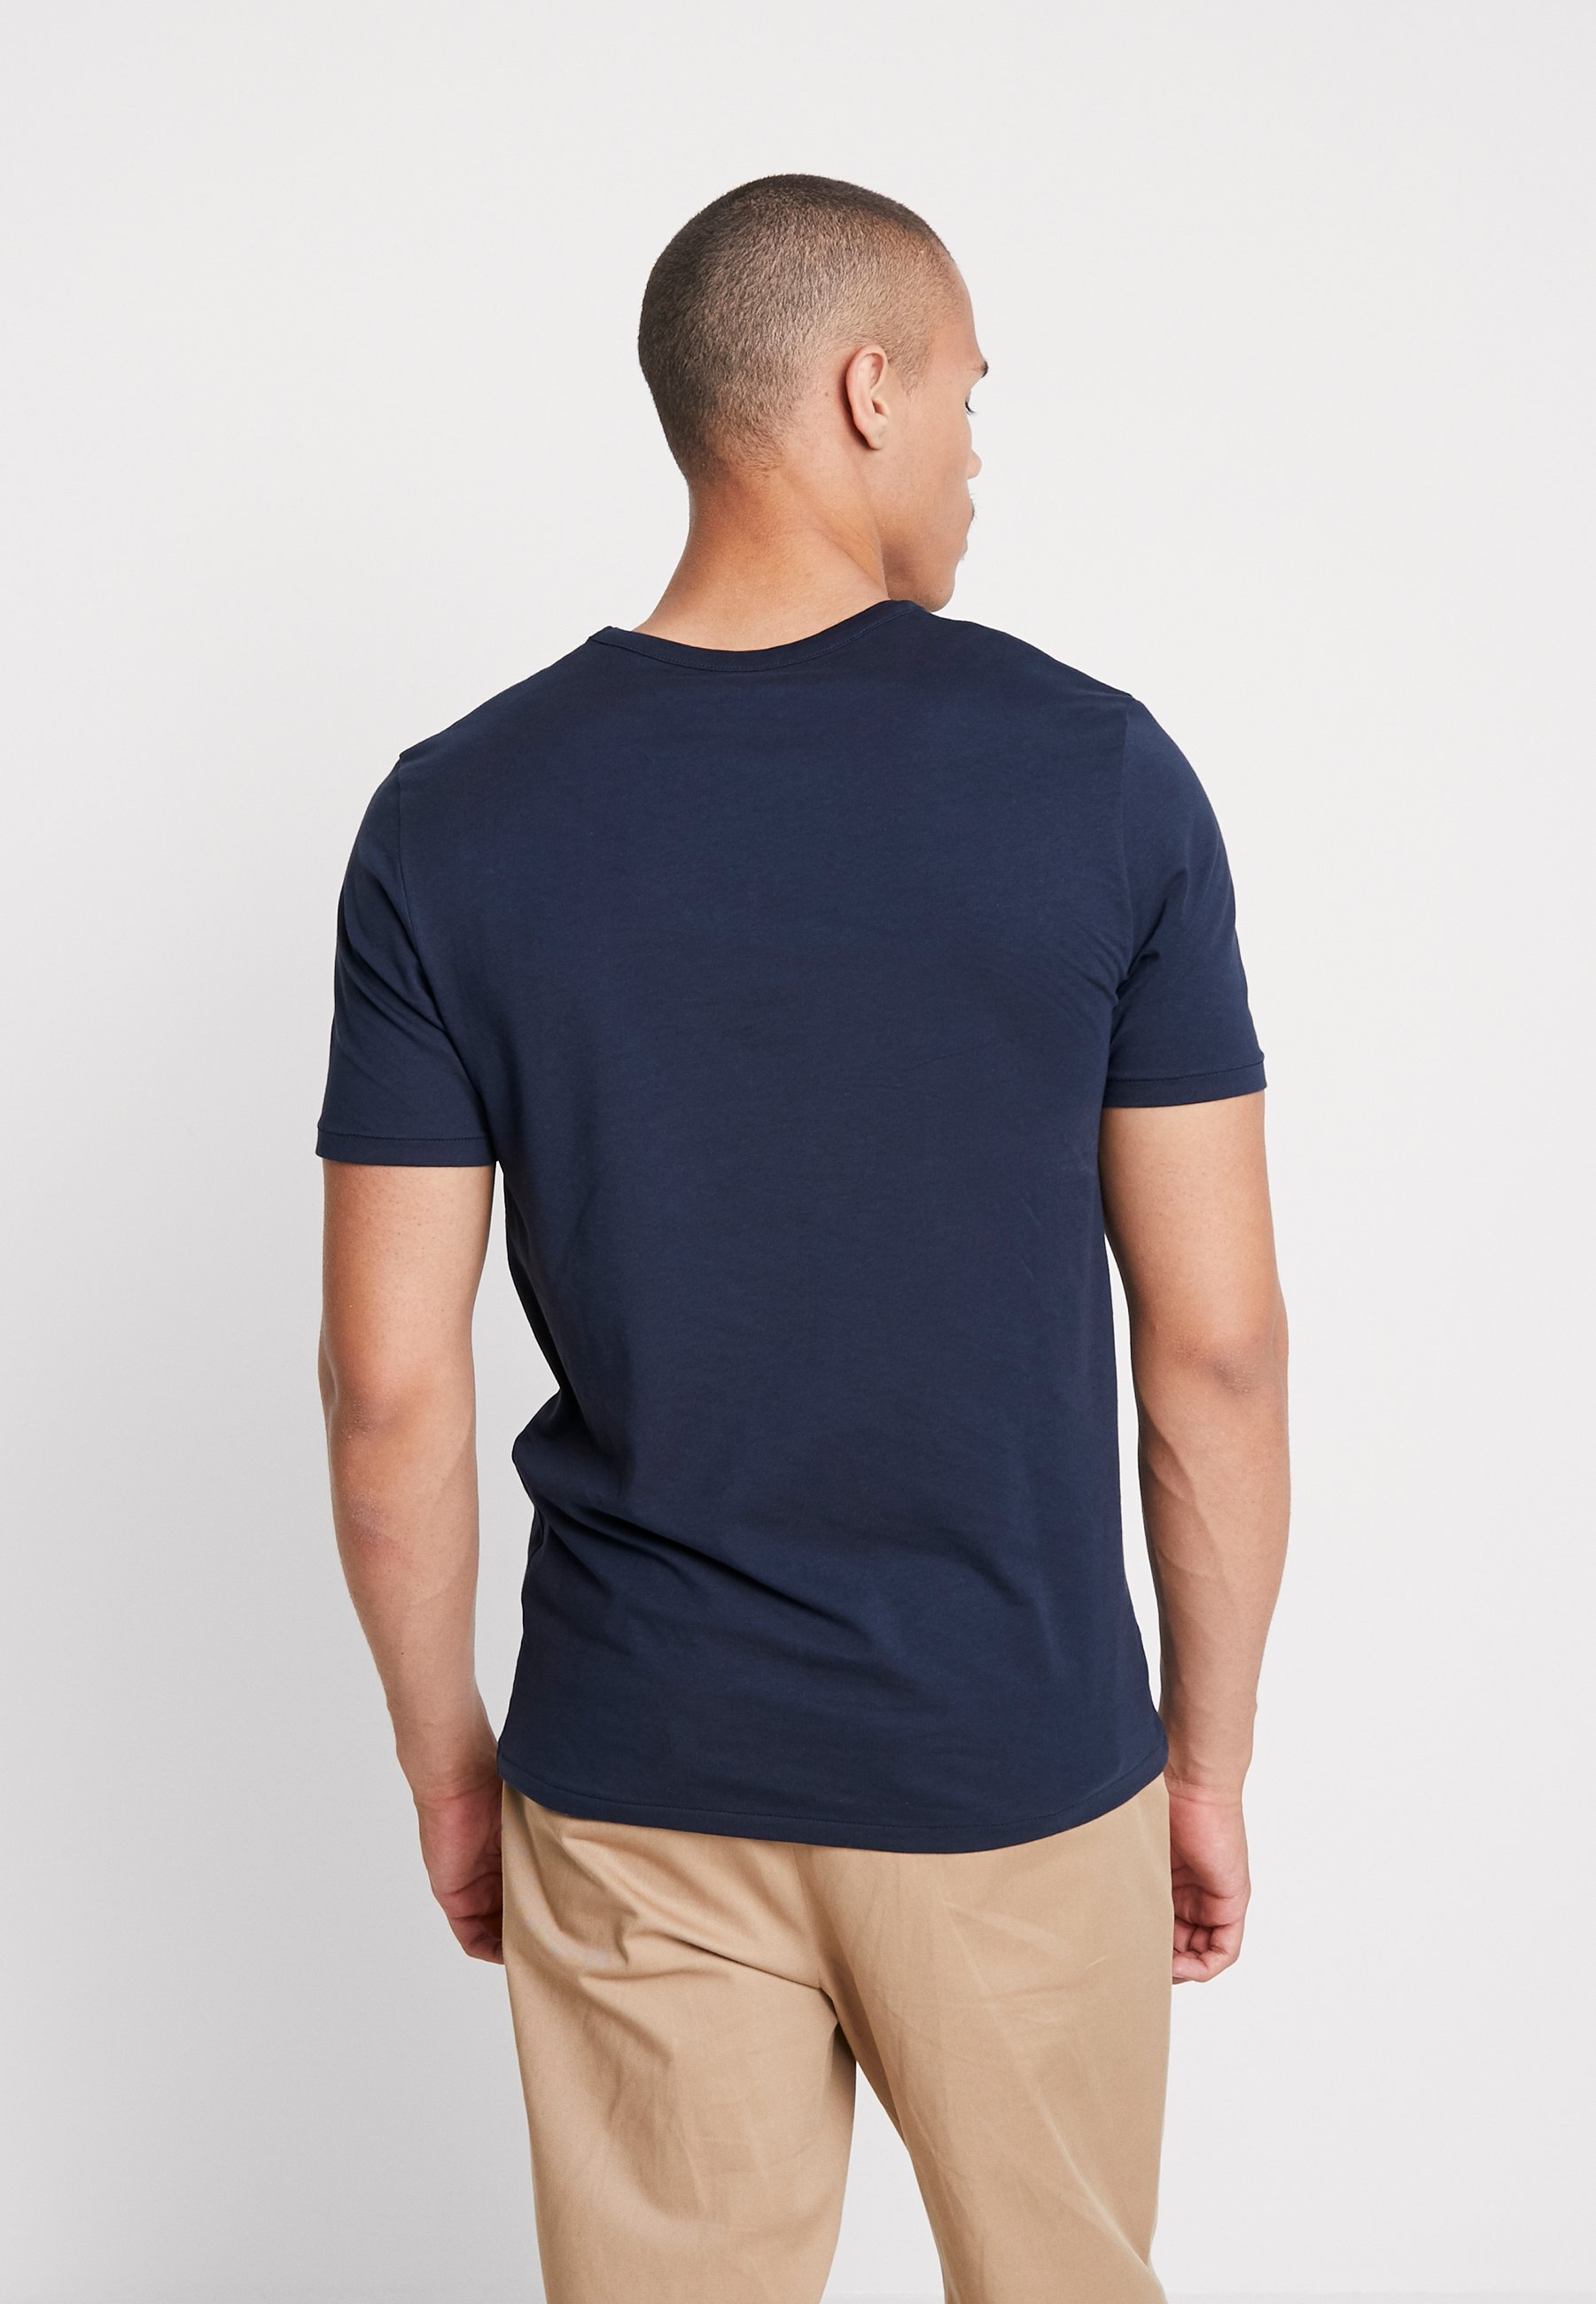 NeckT Imprimé Blazer Jones shirt Jordenvers Tee Crew Navy Jackamp; 4q35LARj